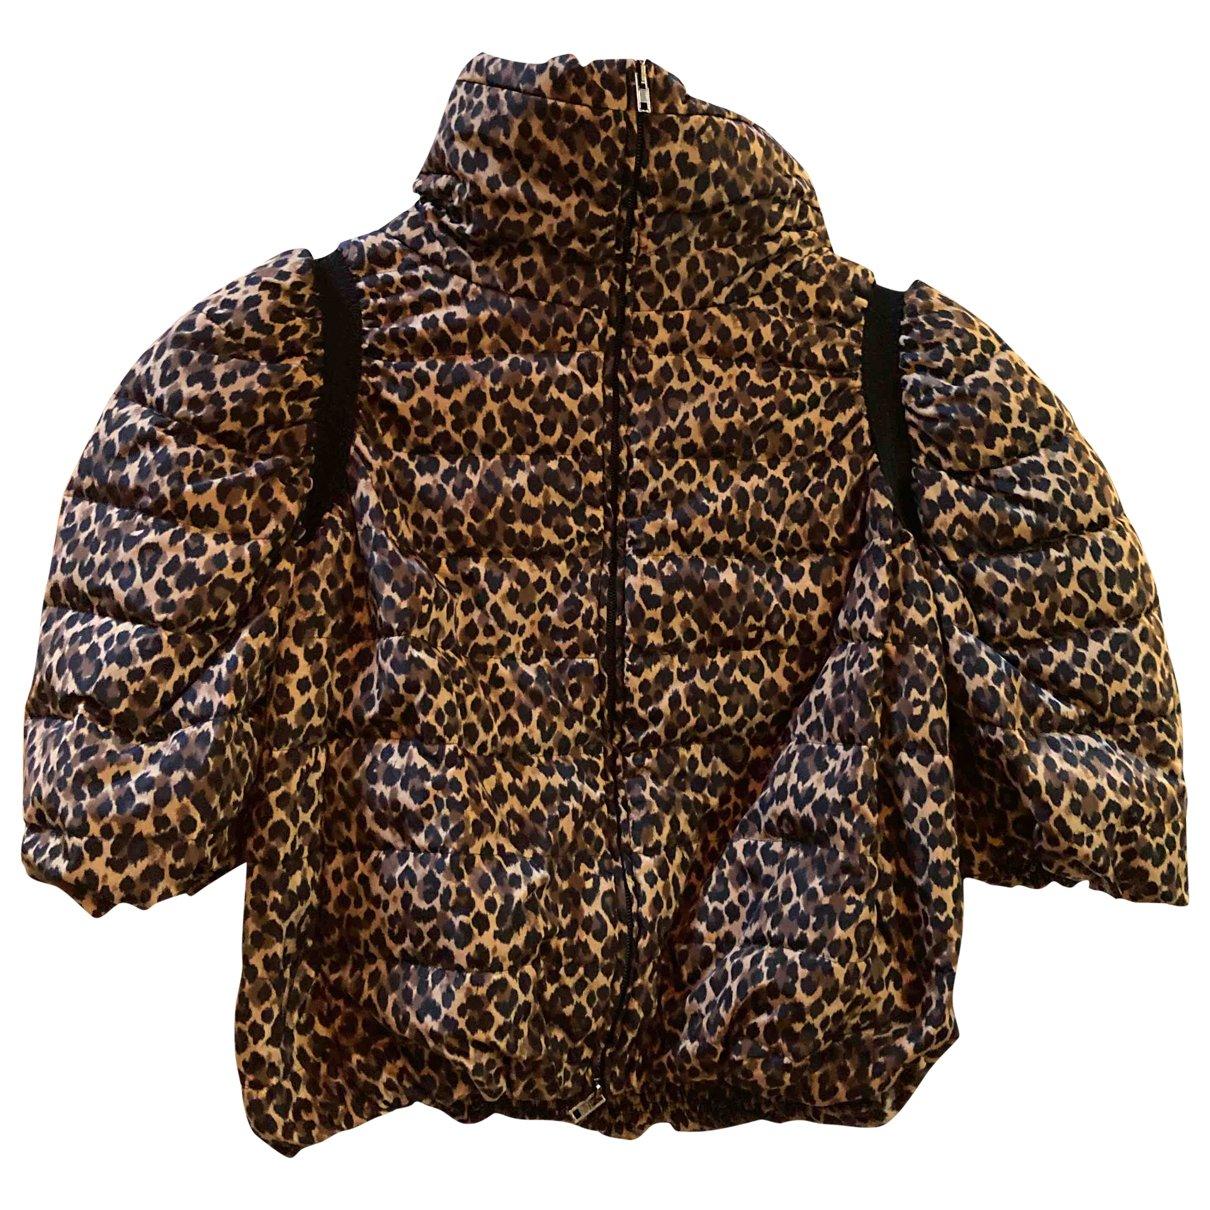 Miu Miu N Multicolour Jacket for Women